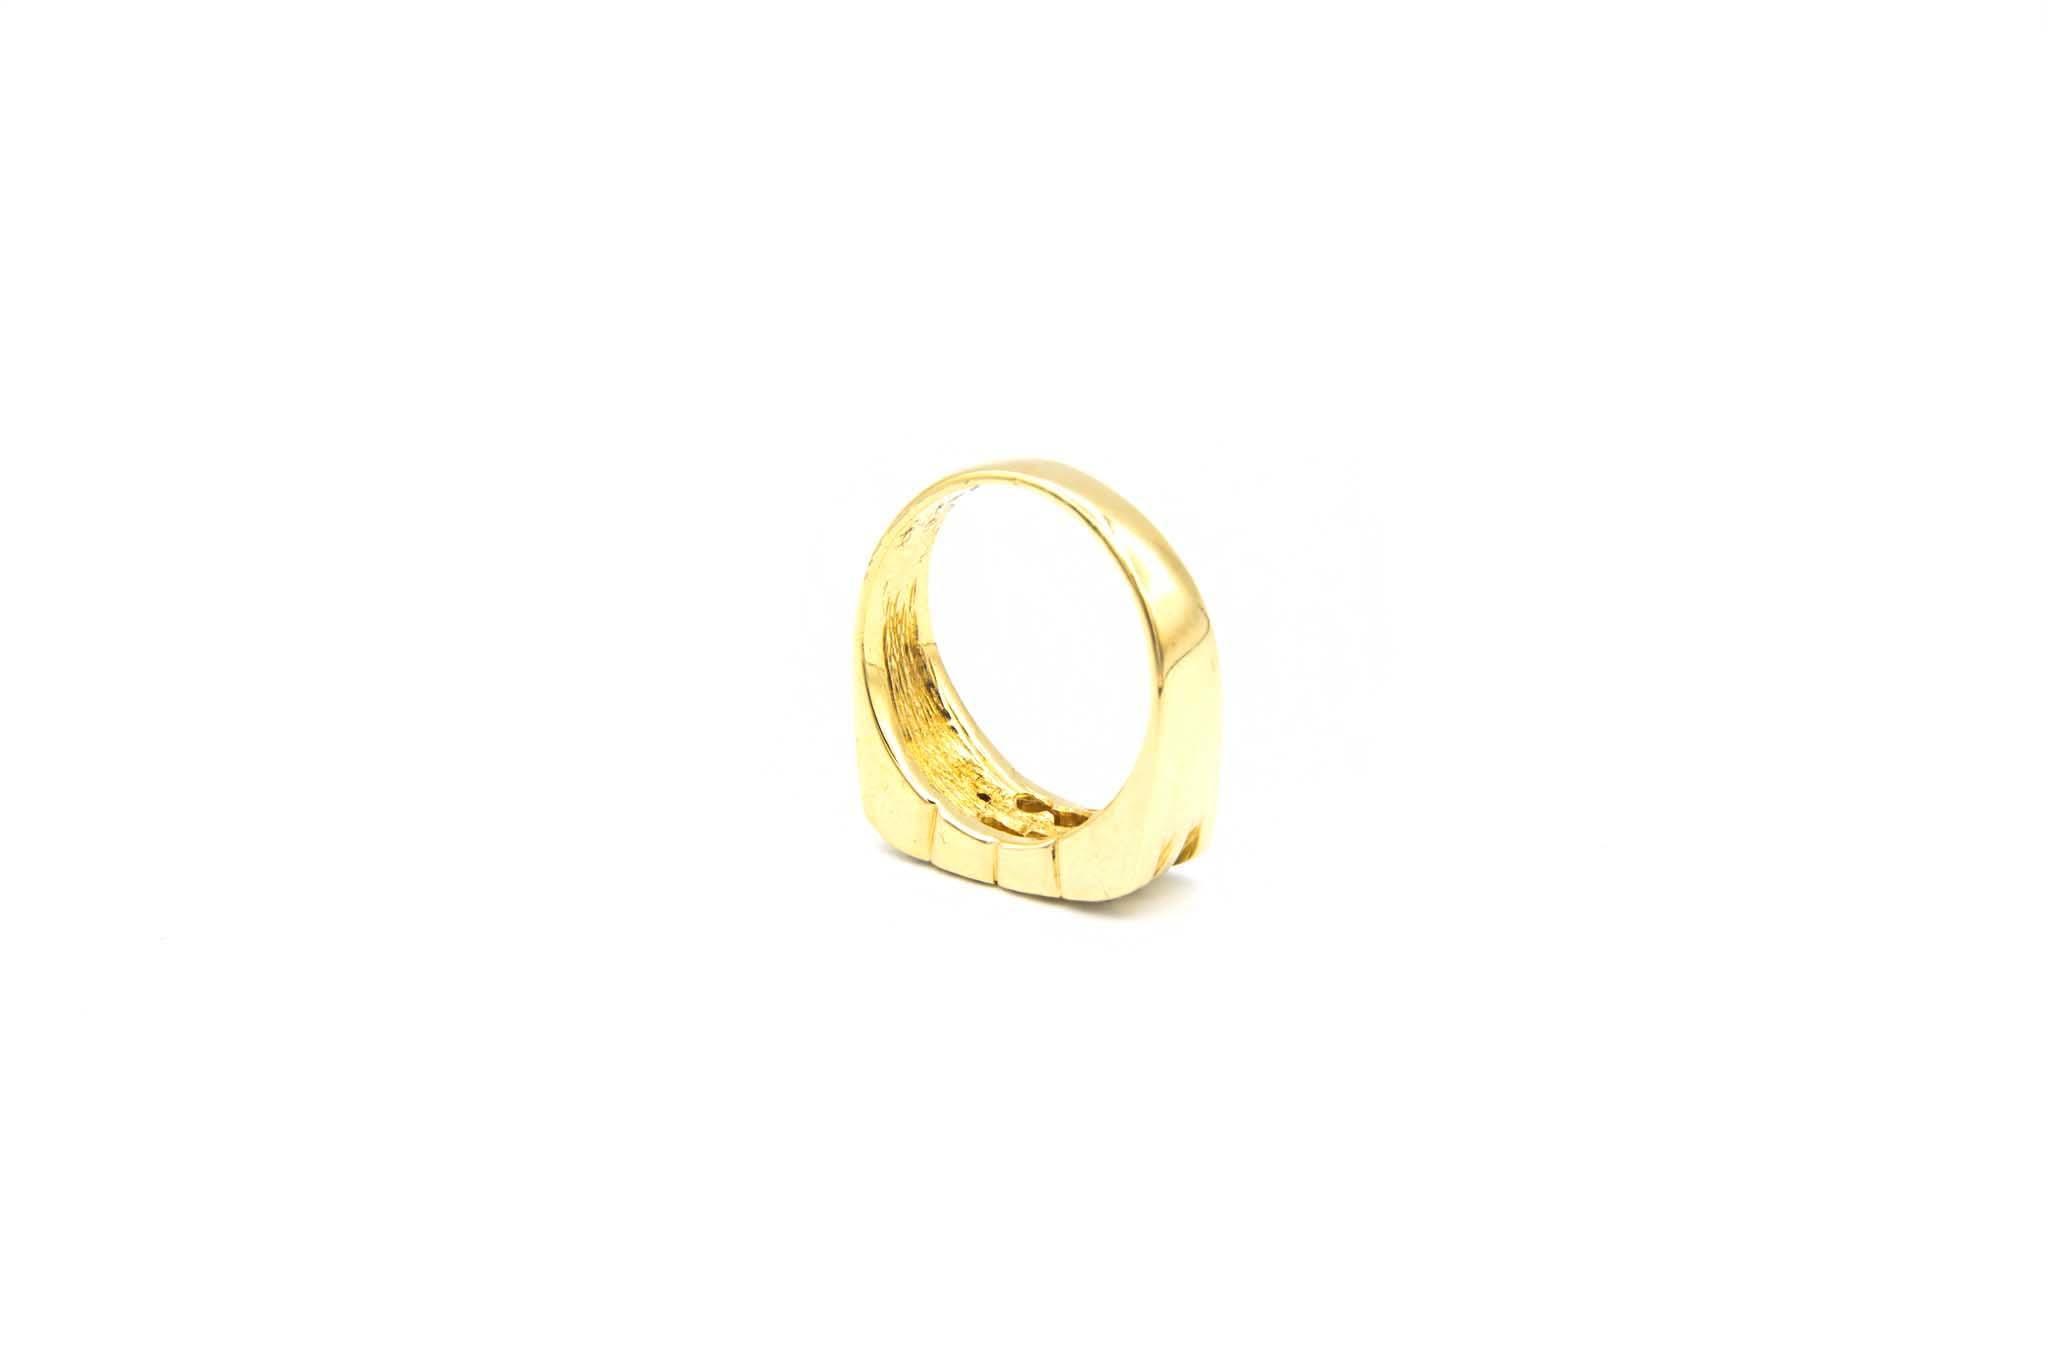 Ring fantasie opengewerkt met diamant-5